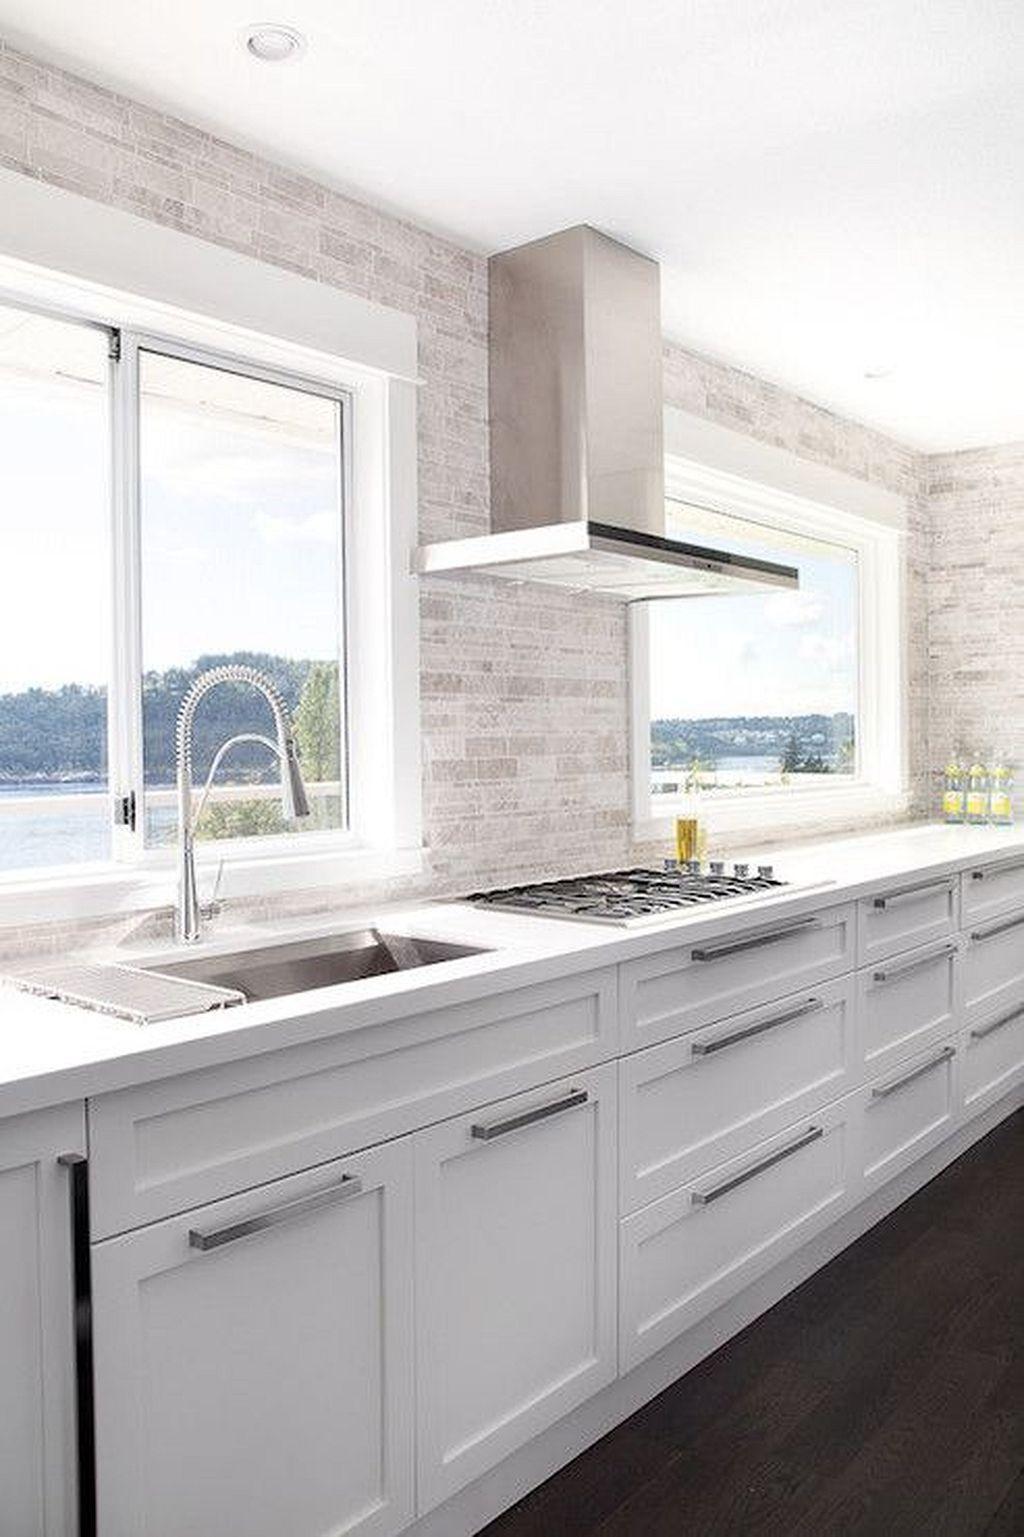 45 Modern White Kitchen Cabinets And Backsplash Design Ideas